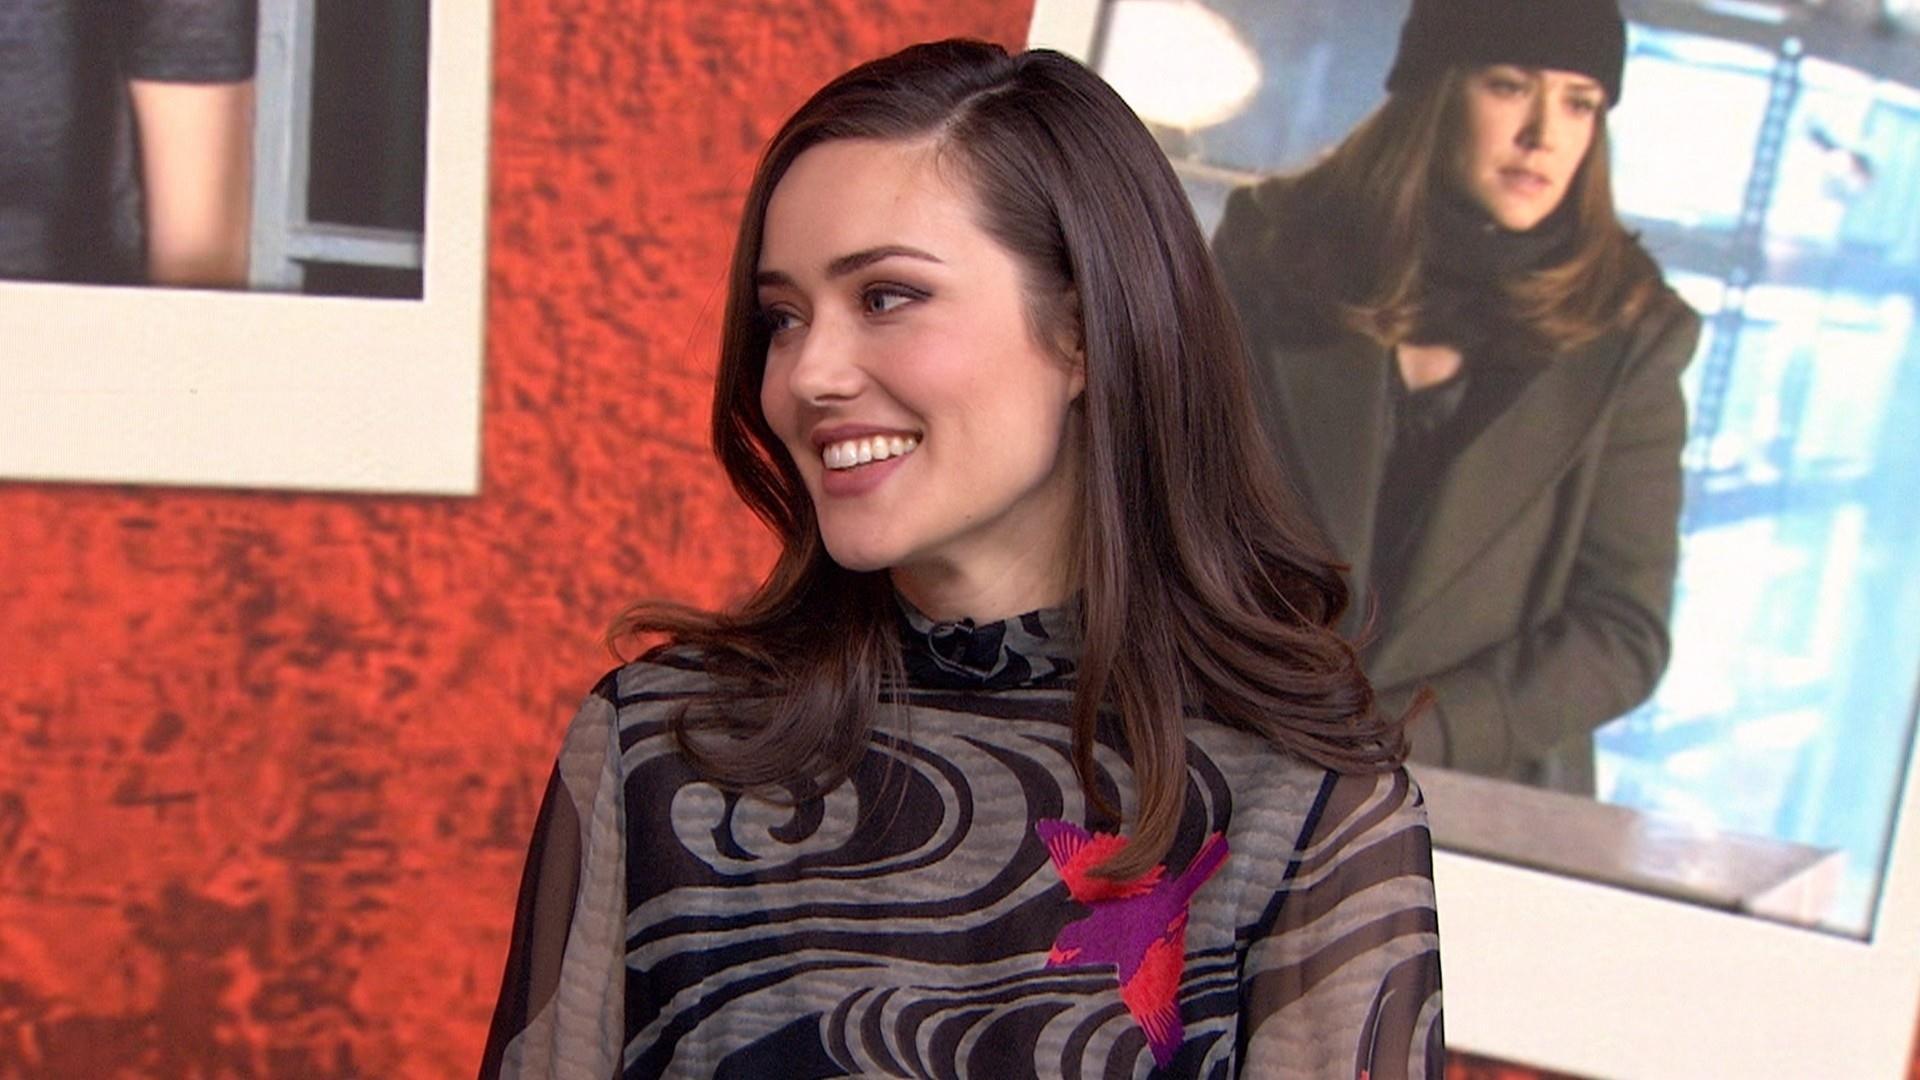 'The Blacklist' star Megan Boone dishes on show's newest season